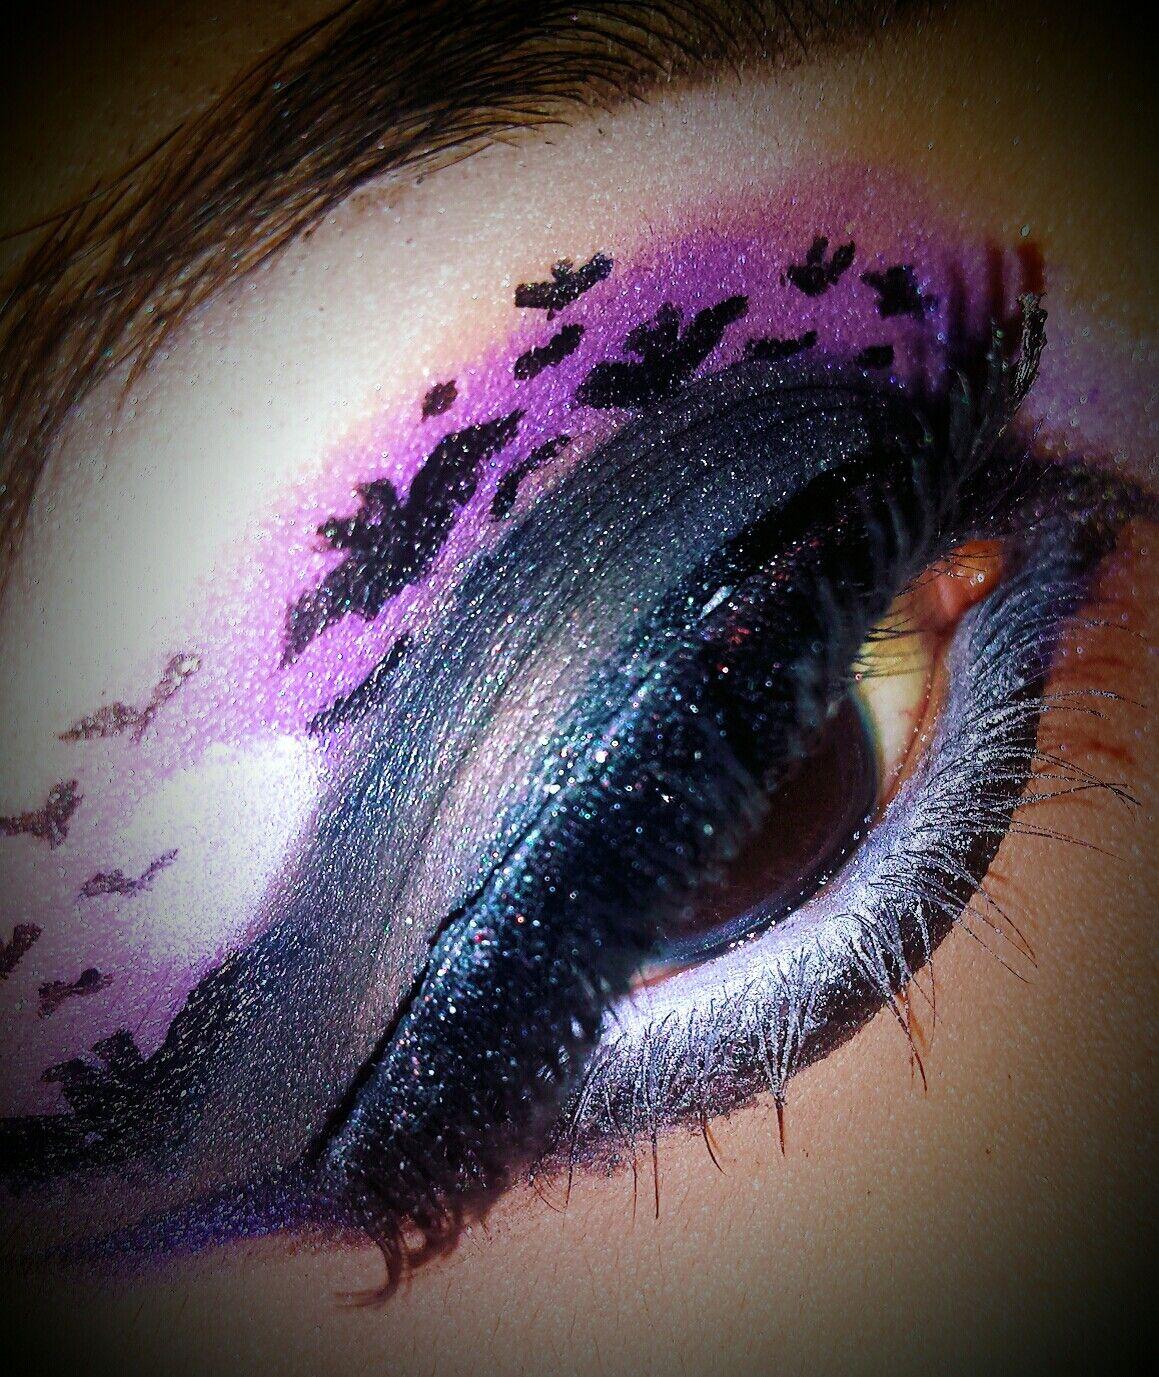 Makeup Bats at night violet black and bats